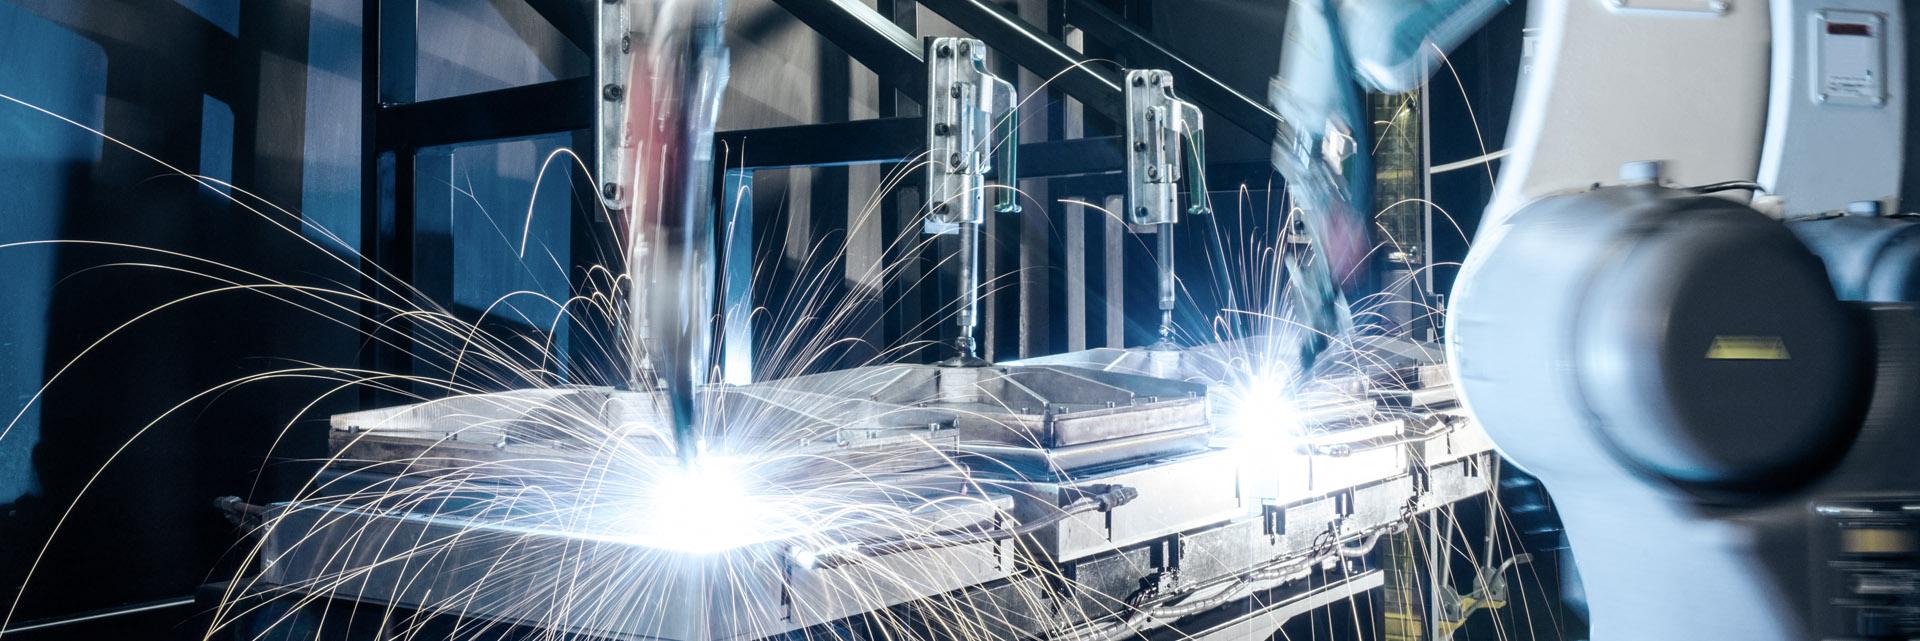 3ZS1322-6CC13-0YA5 | Siemens | General Automation | DAX Automation